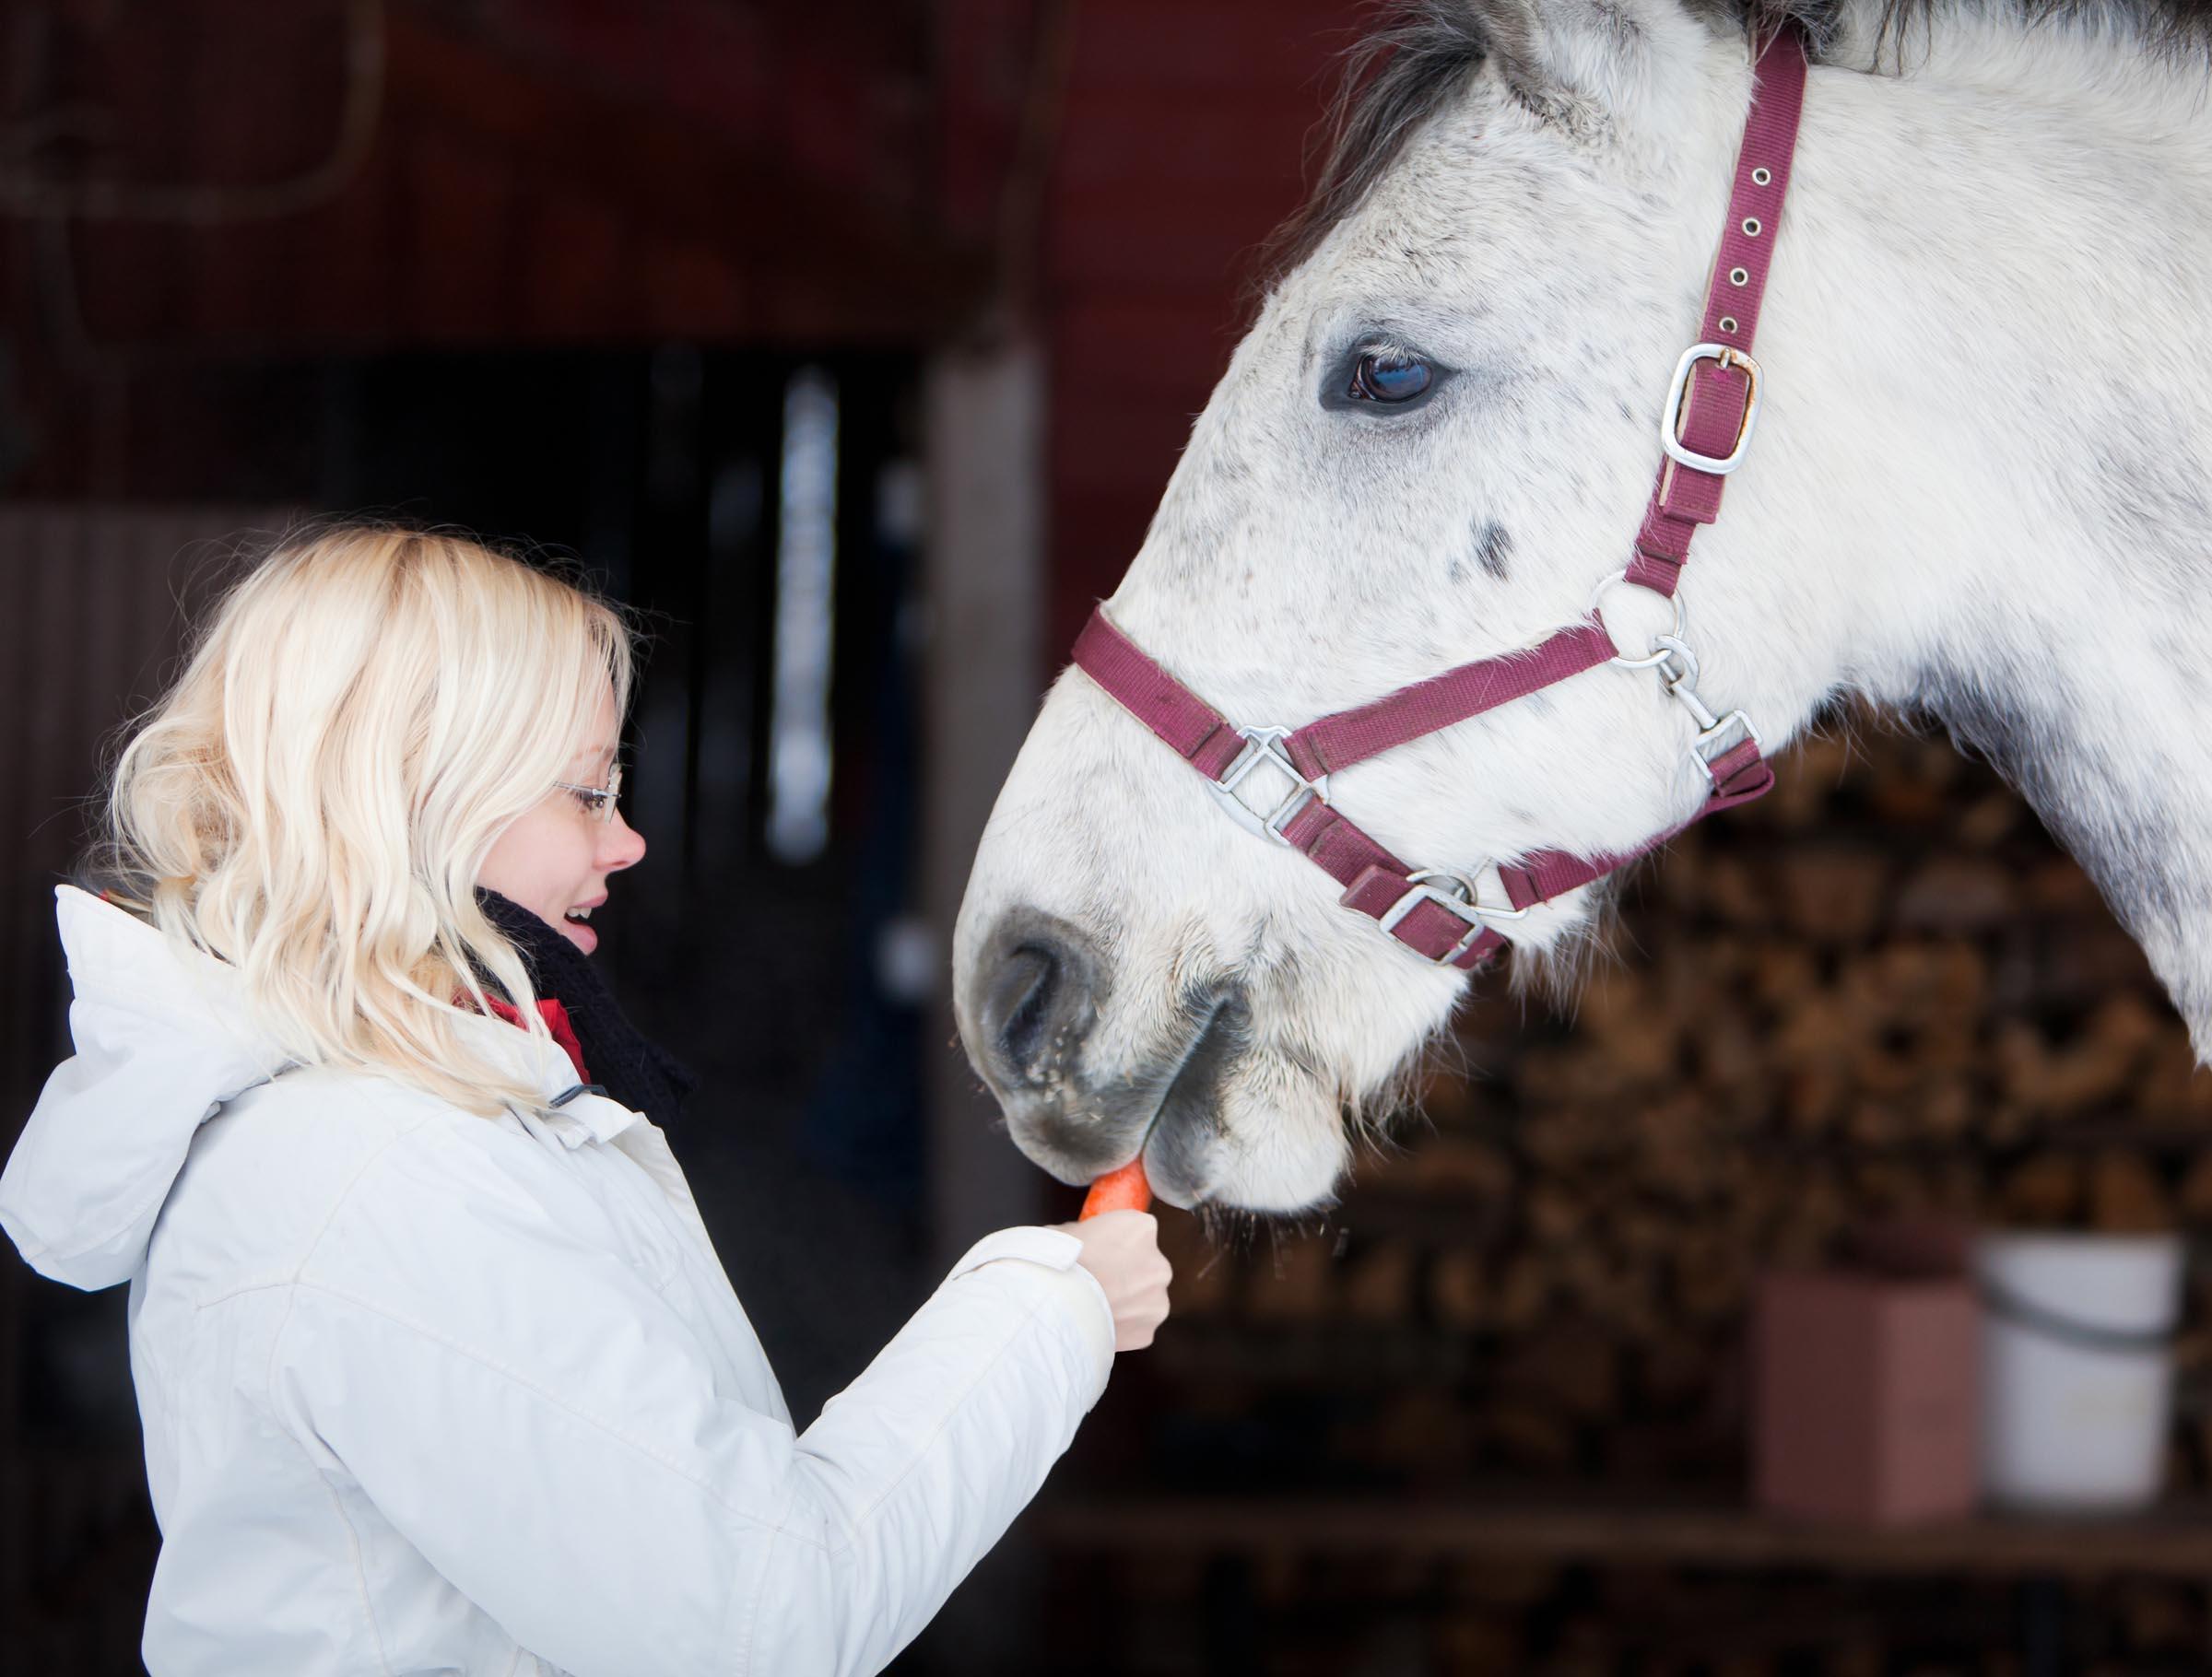 Caucasian Blonde Woman Feeding Carrots To Lipizzaner Horse Stallion